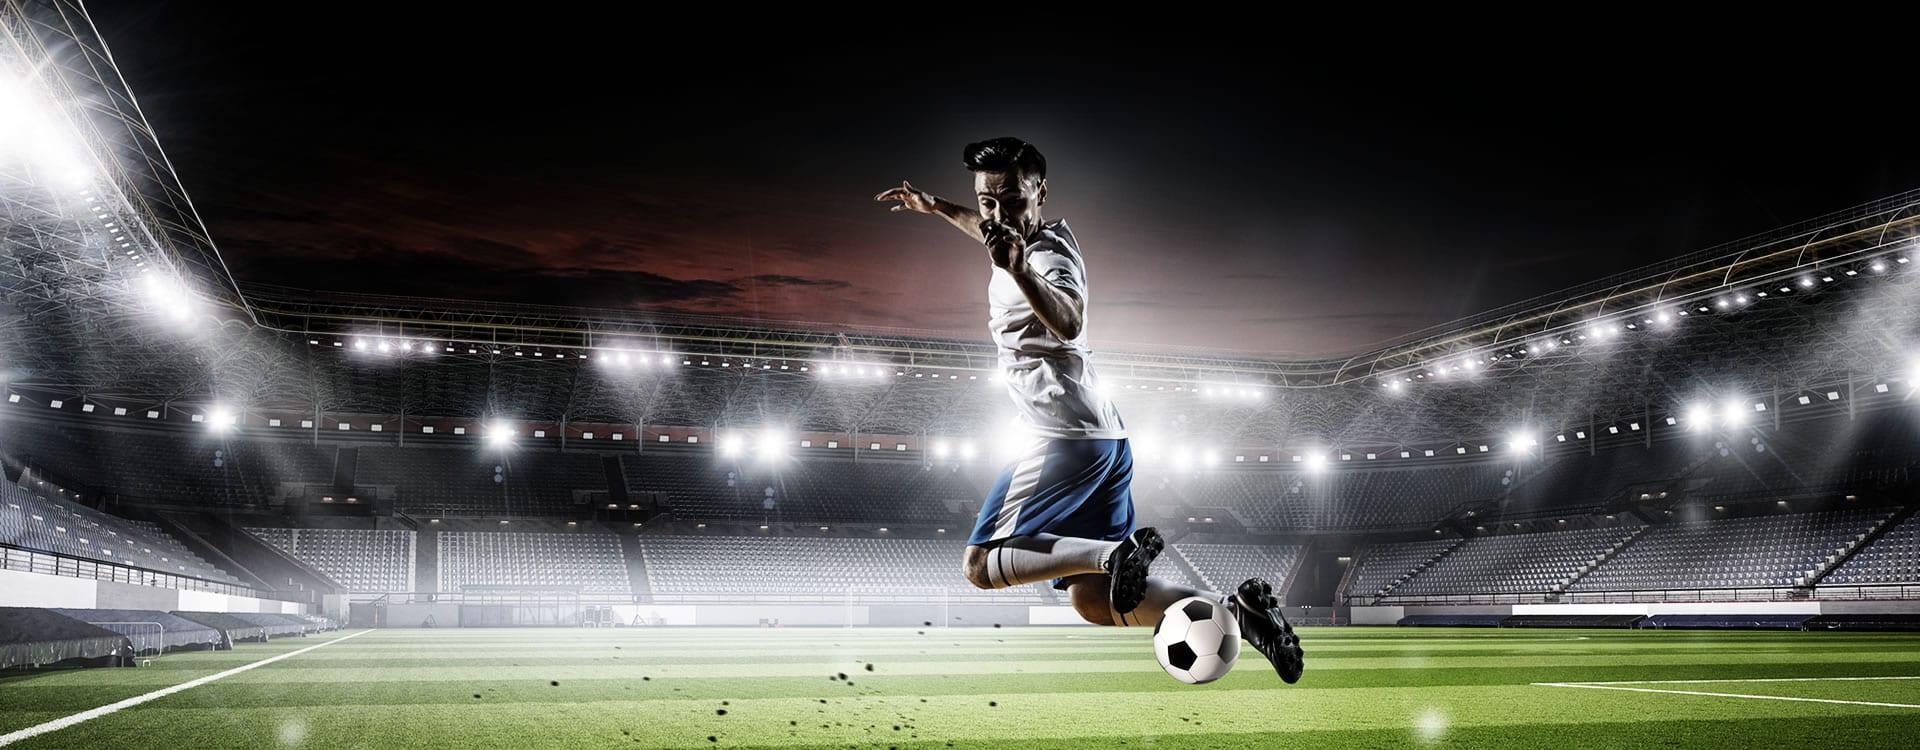 Fabricante e distribuidor de uniformes esportivos personalizados